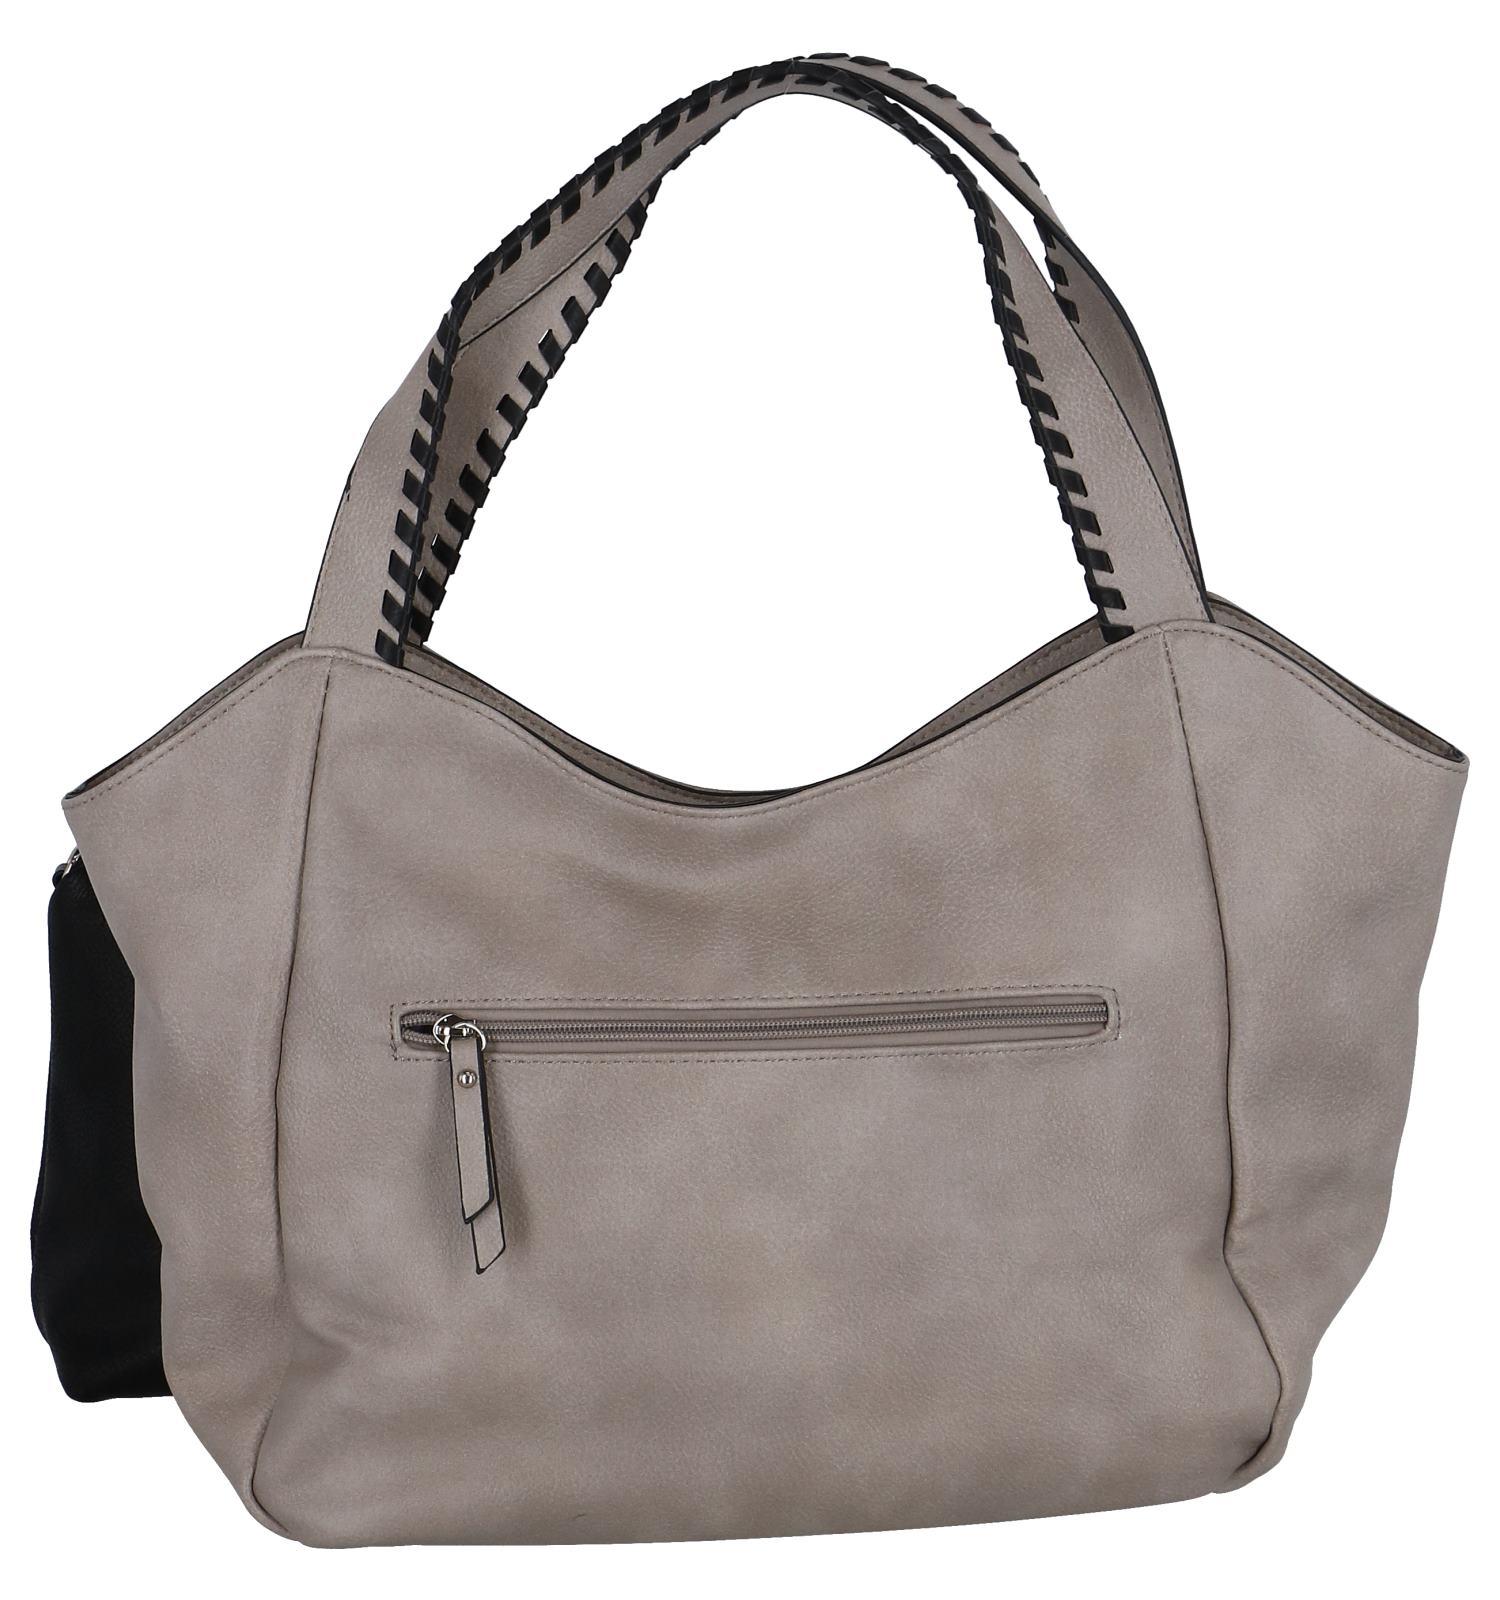 Taupe Bag in Bag Schoudertas Emily & Noah | SCHOENENTORFS.NL